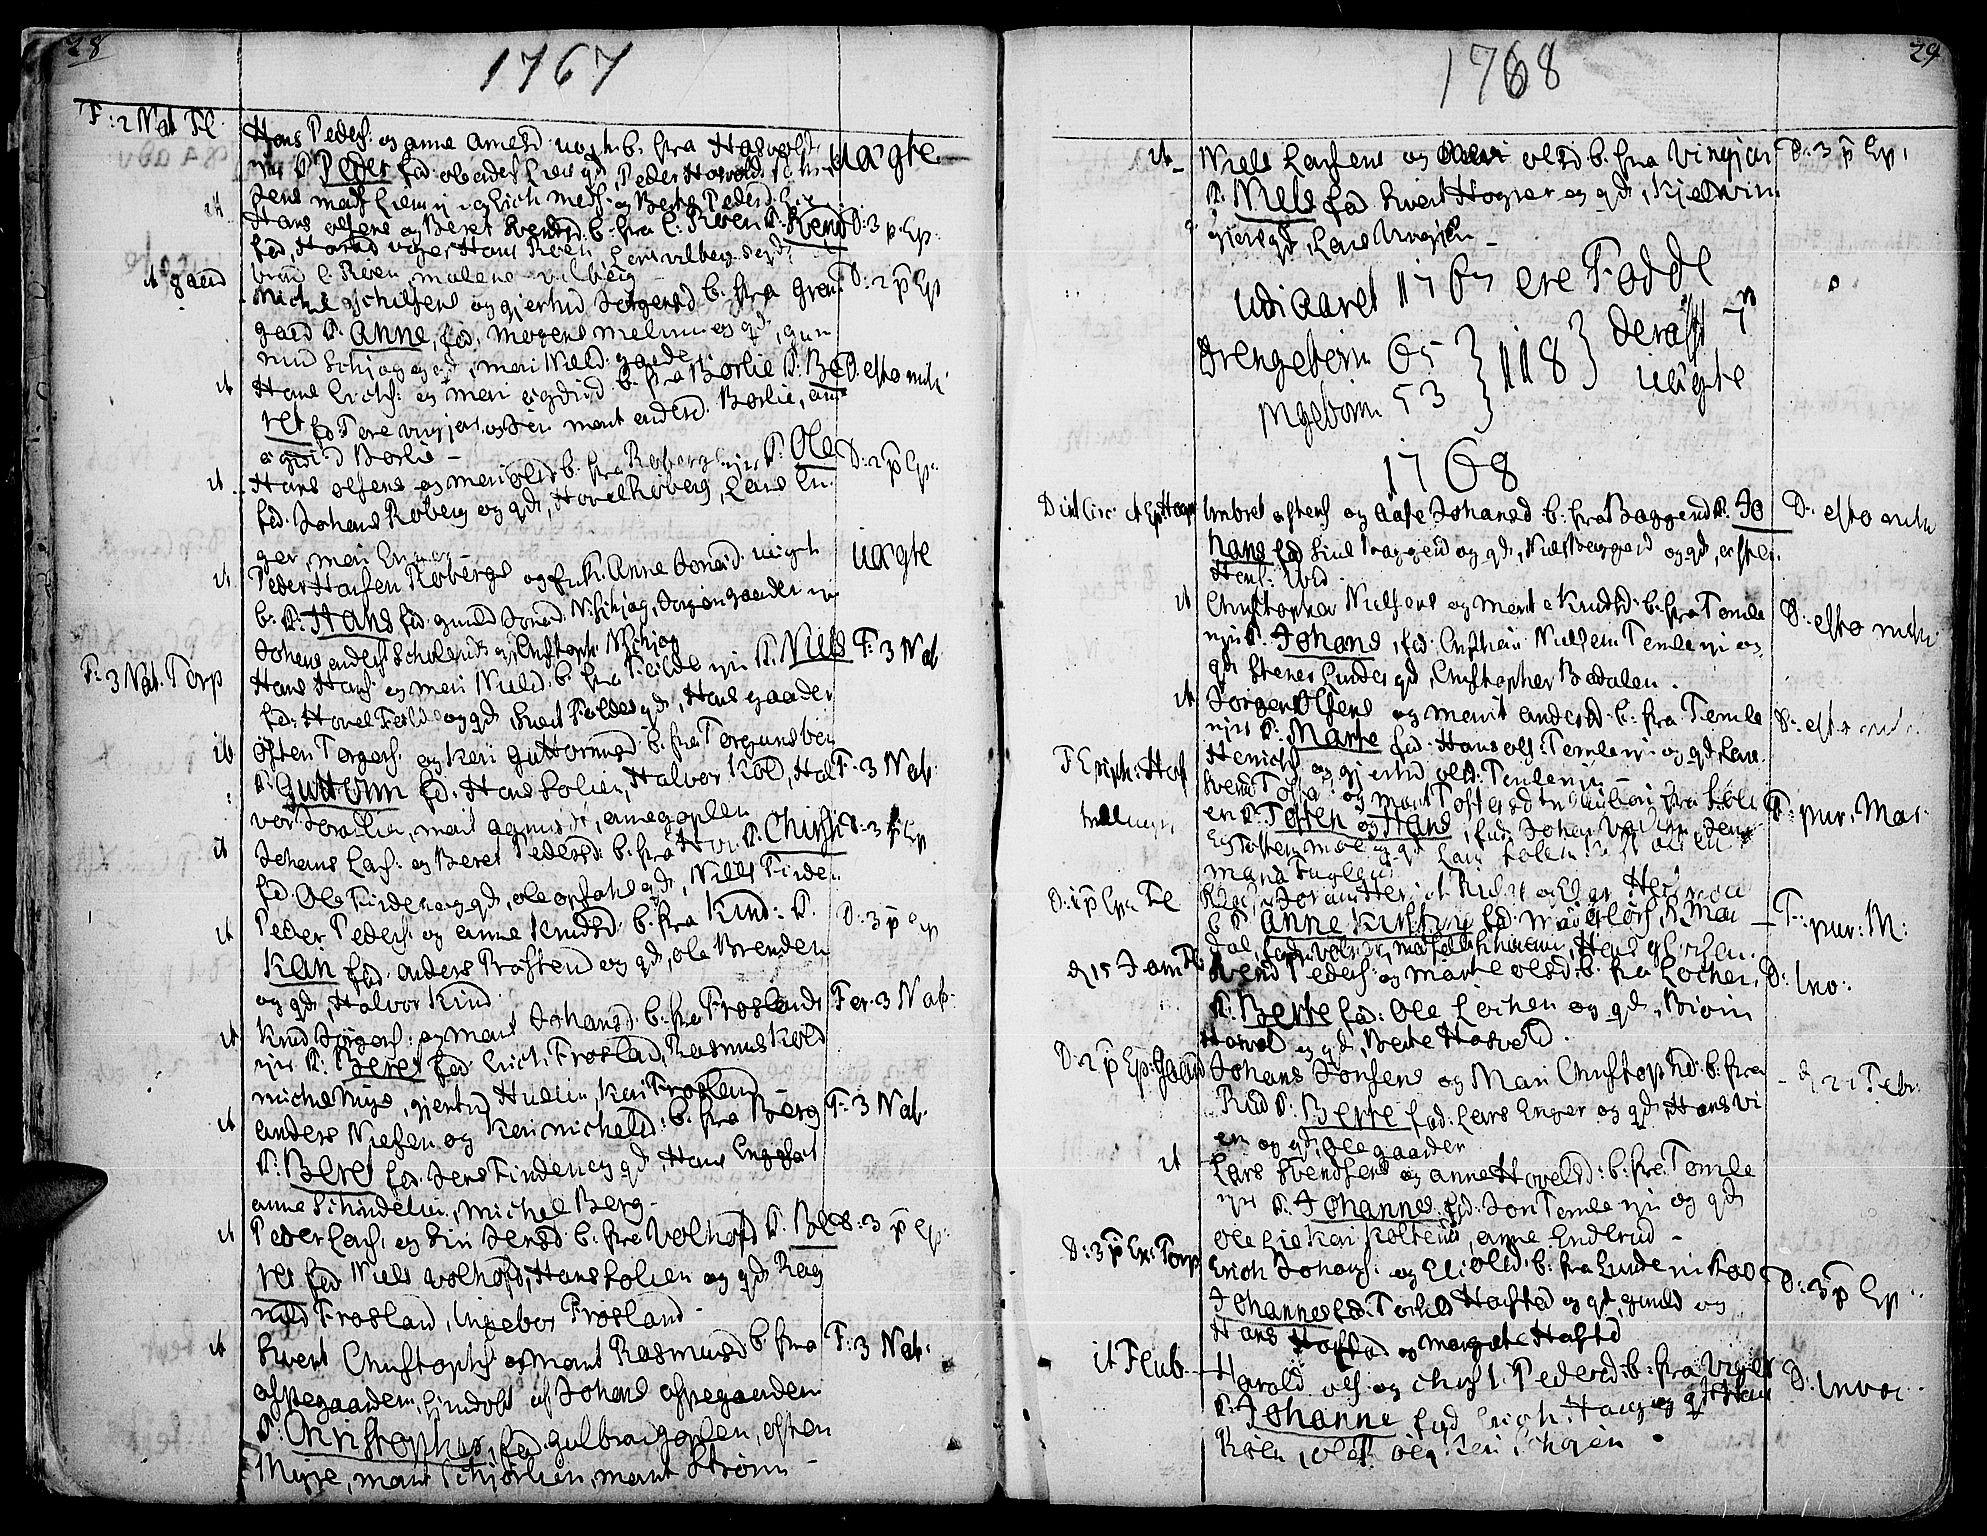 SAH, Land prestekontor, Ministerialbok nr. 5, 1765-1784, s. 28-29